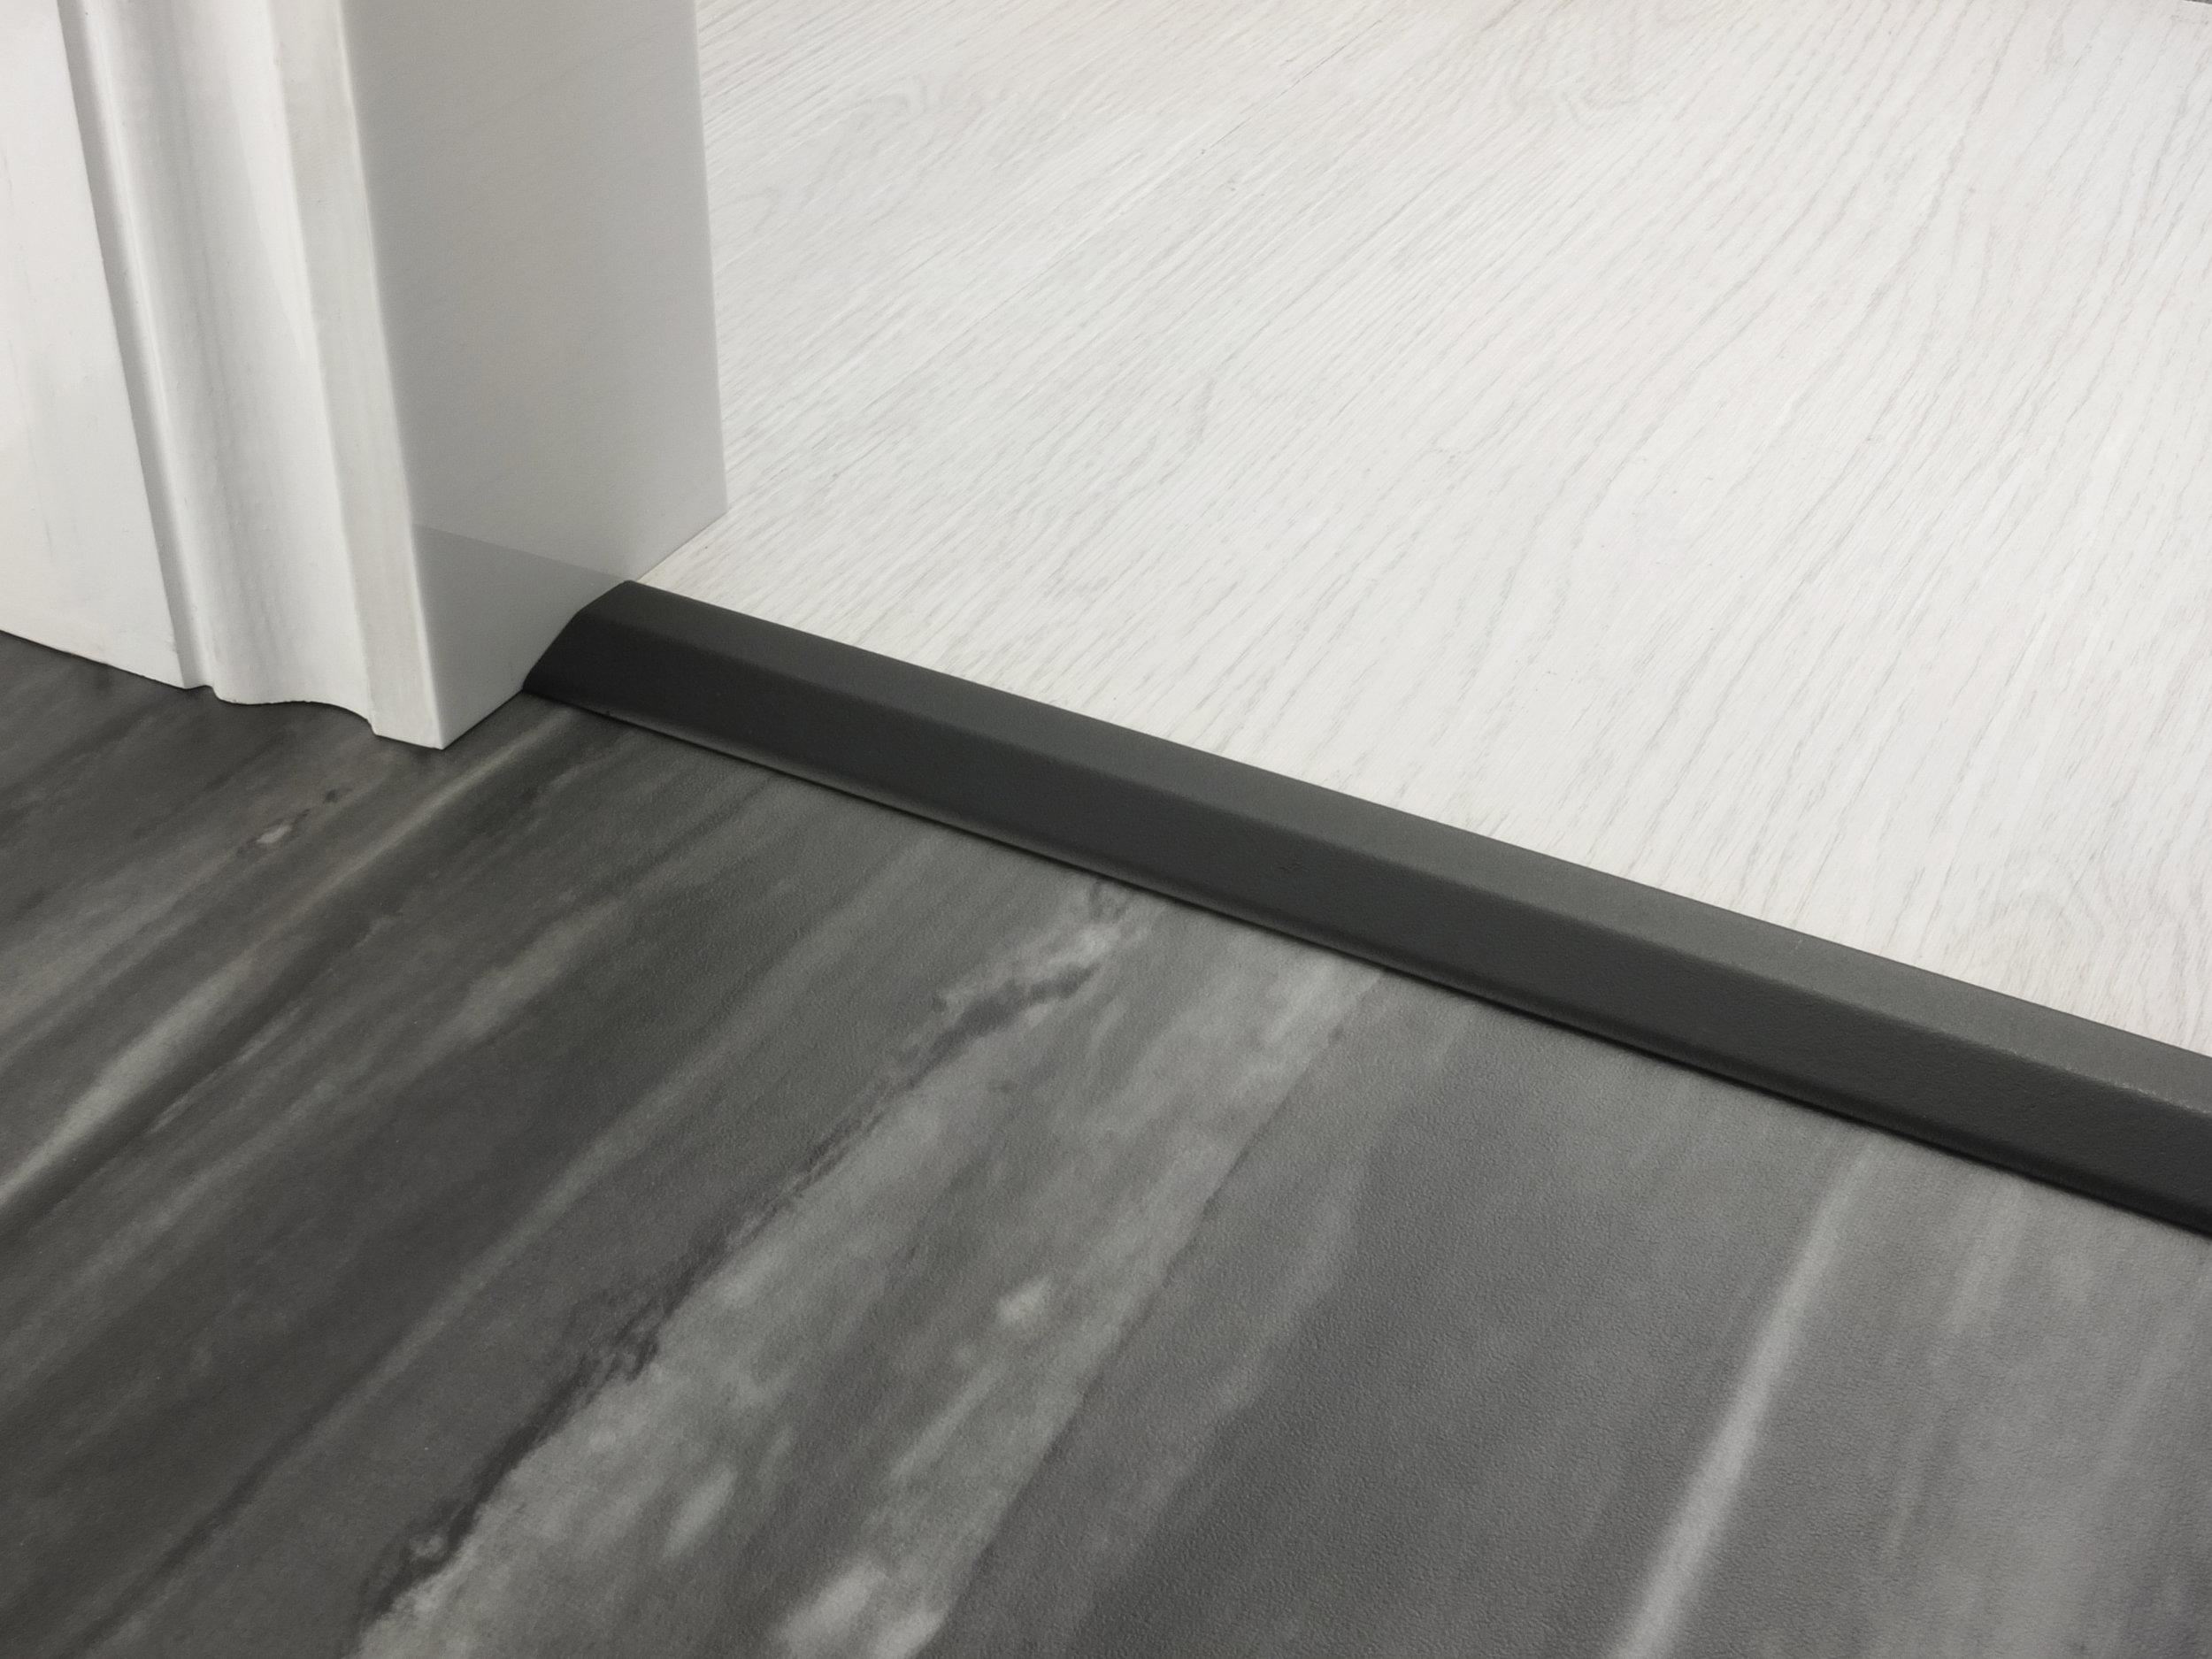 stairrods-doorbar-satin-black-two-way-ramp-4-5mm.jpg